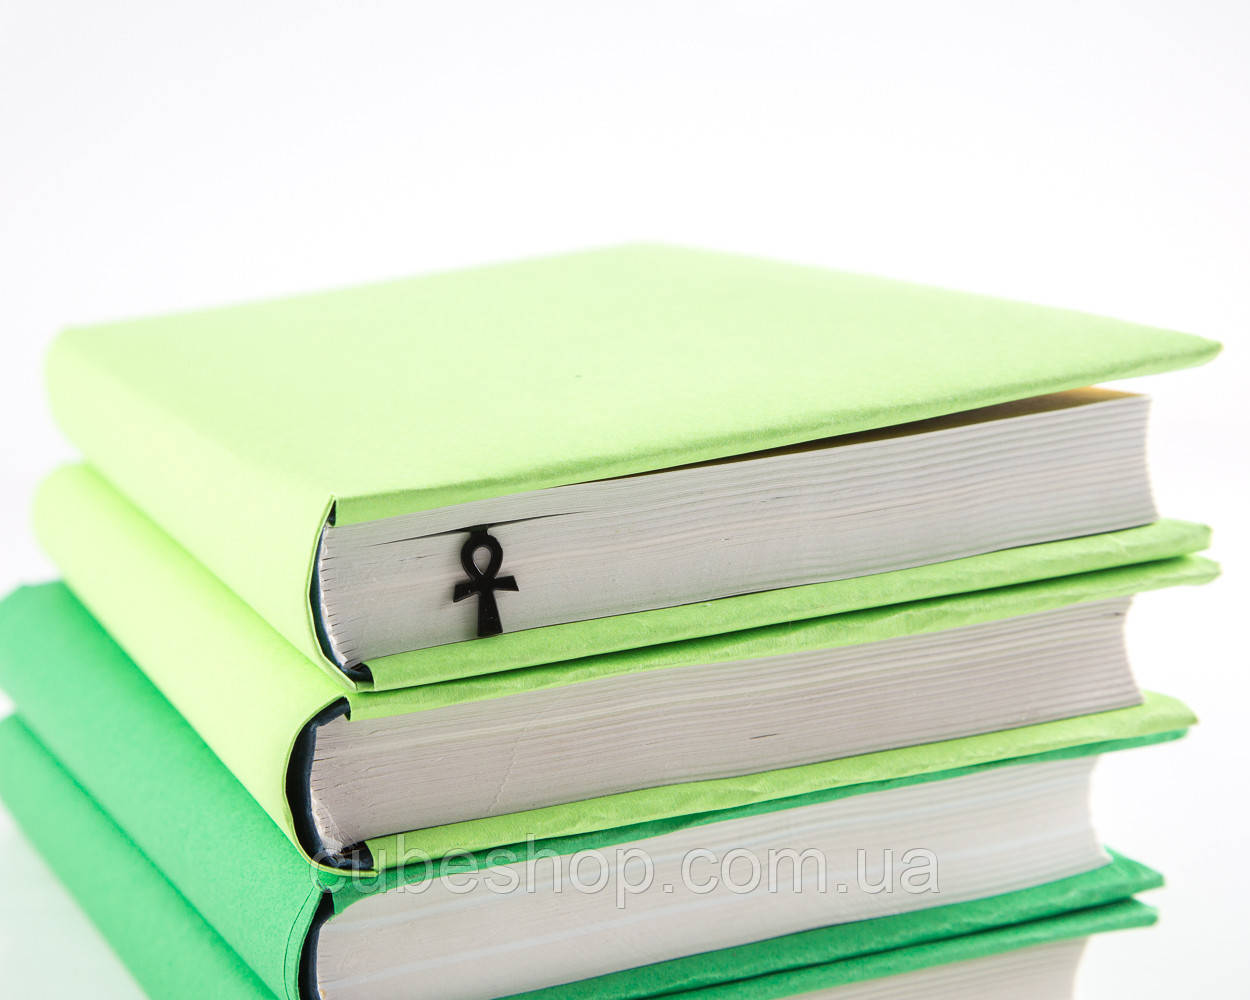 Закладка для книг Анх